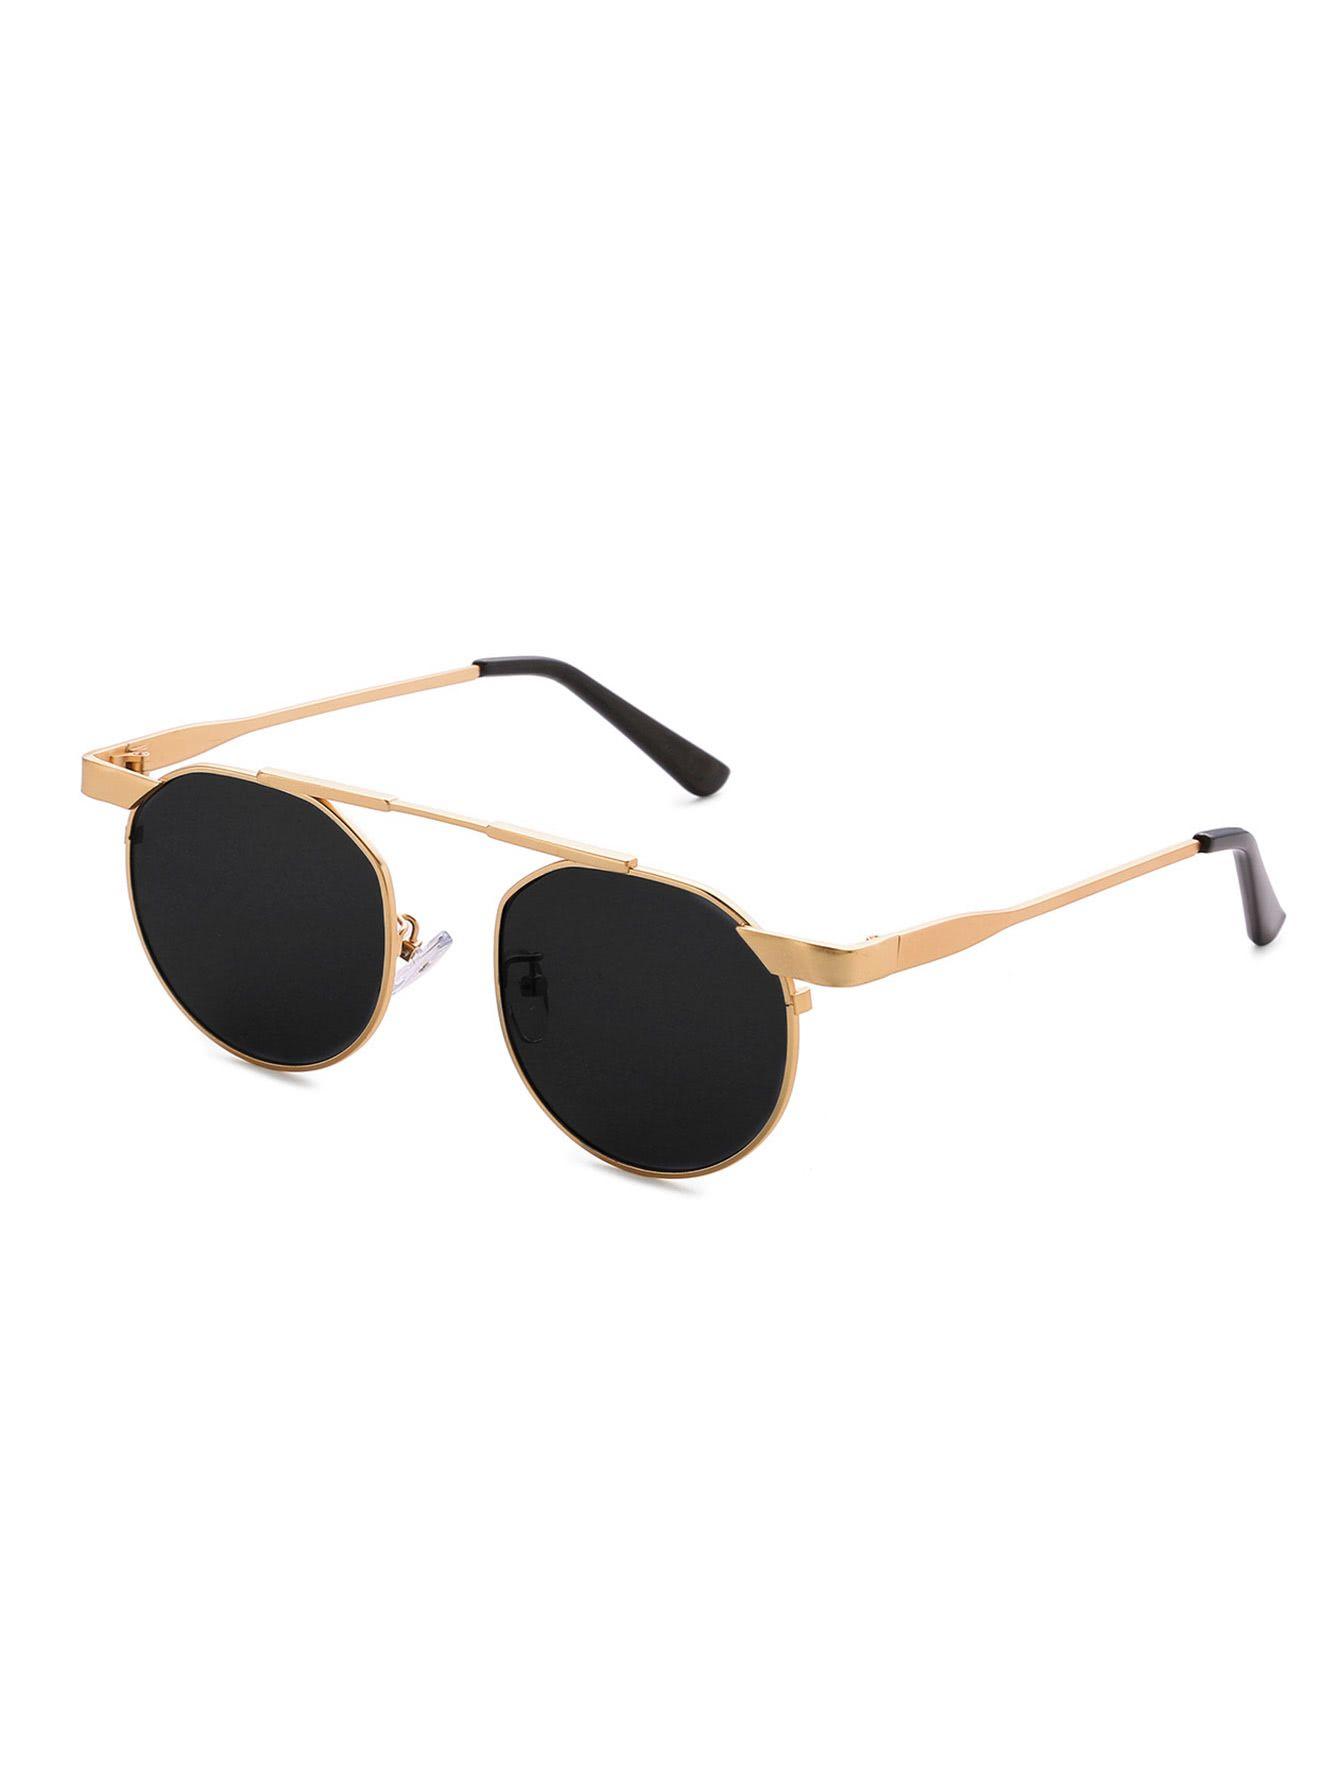 Top Bar Round Sunglasses